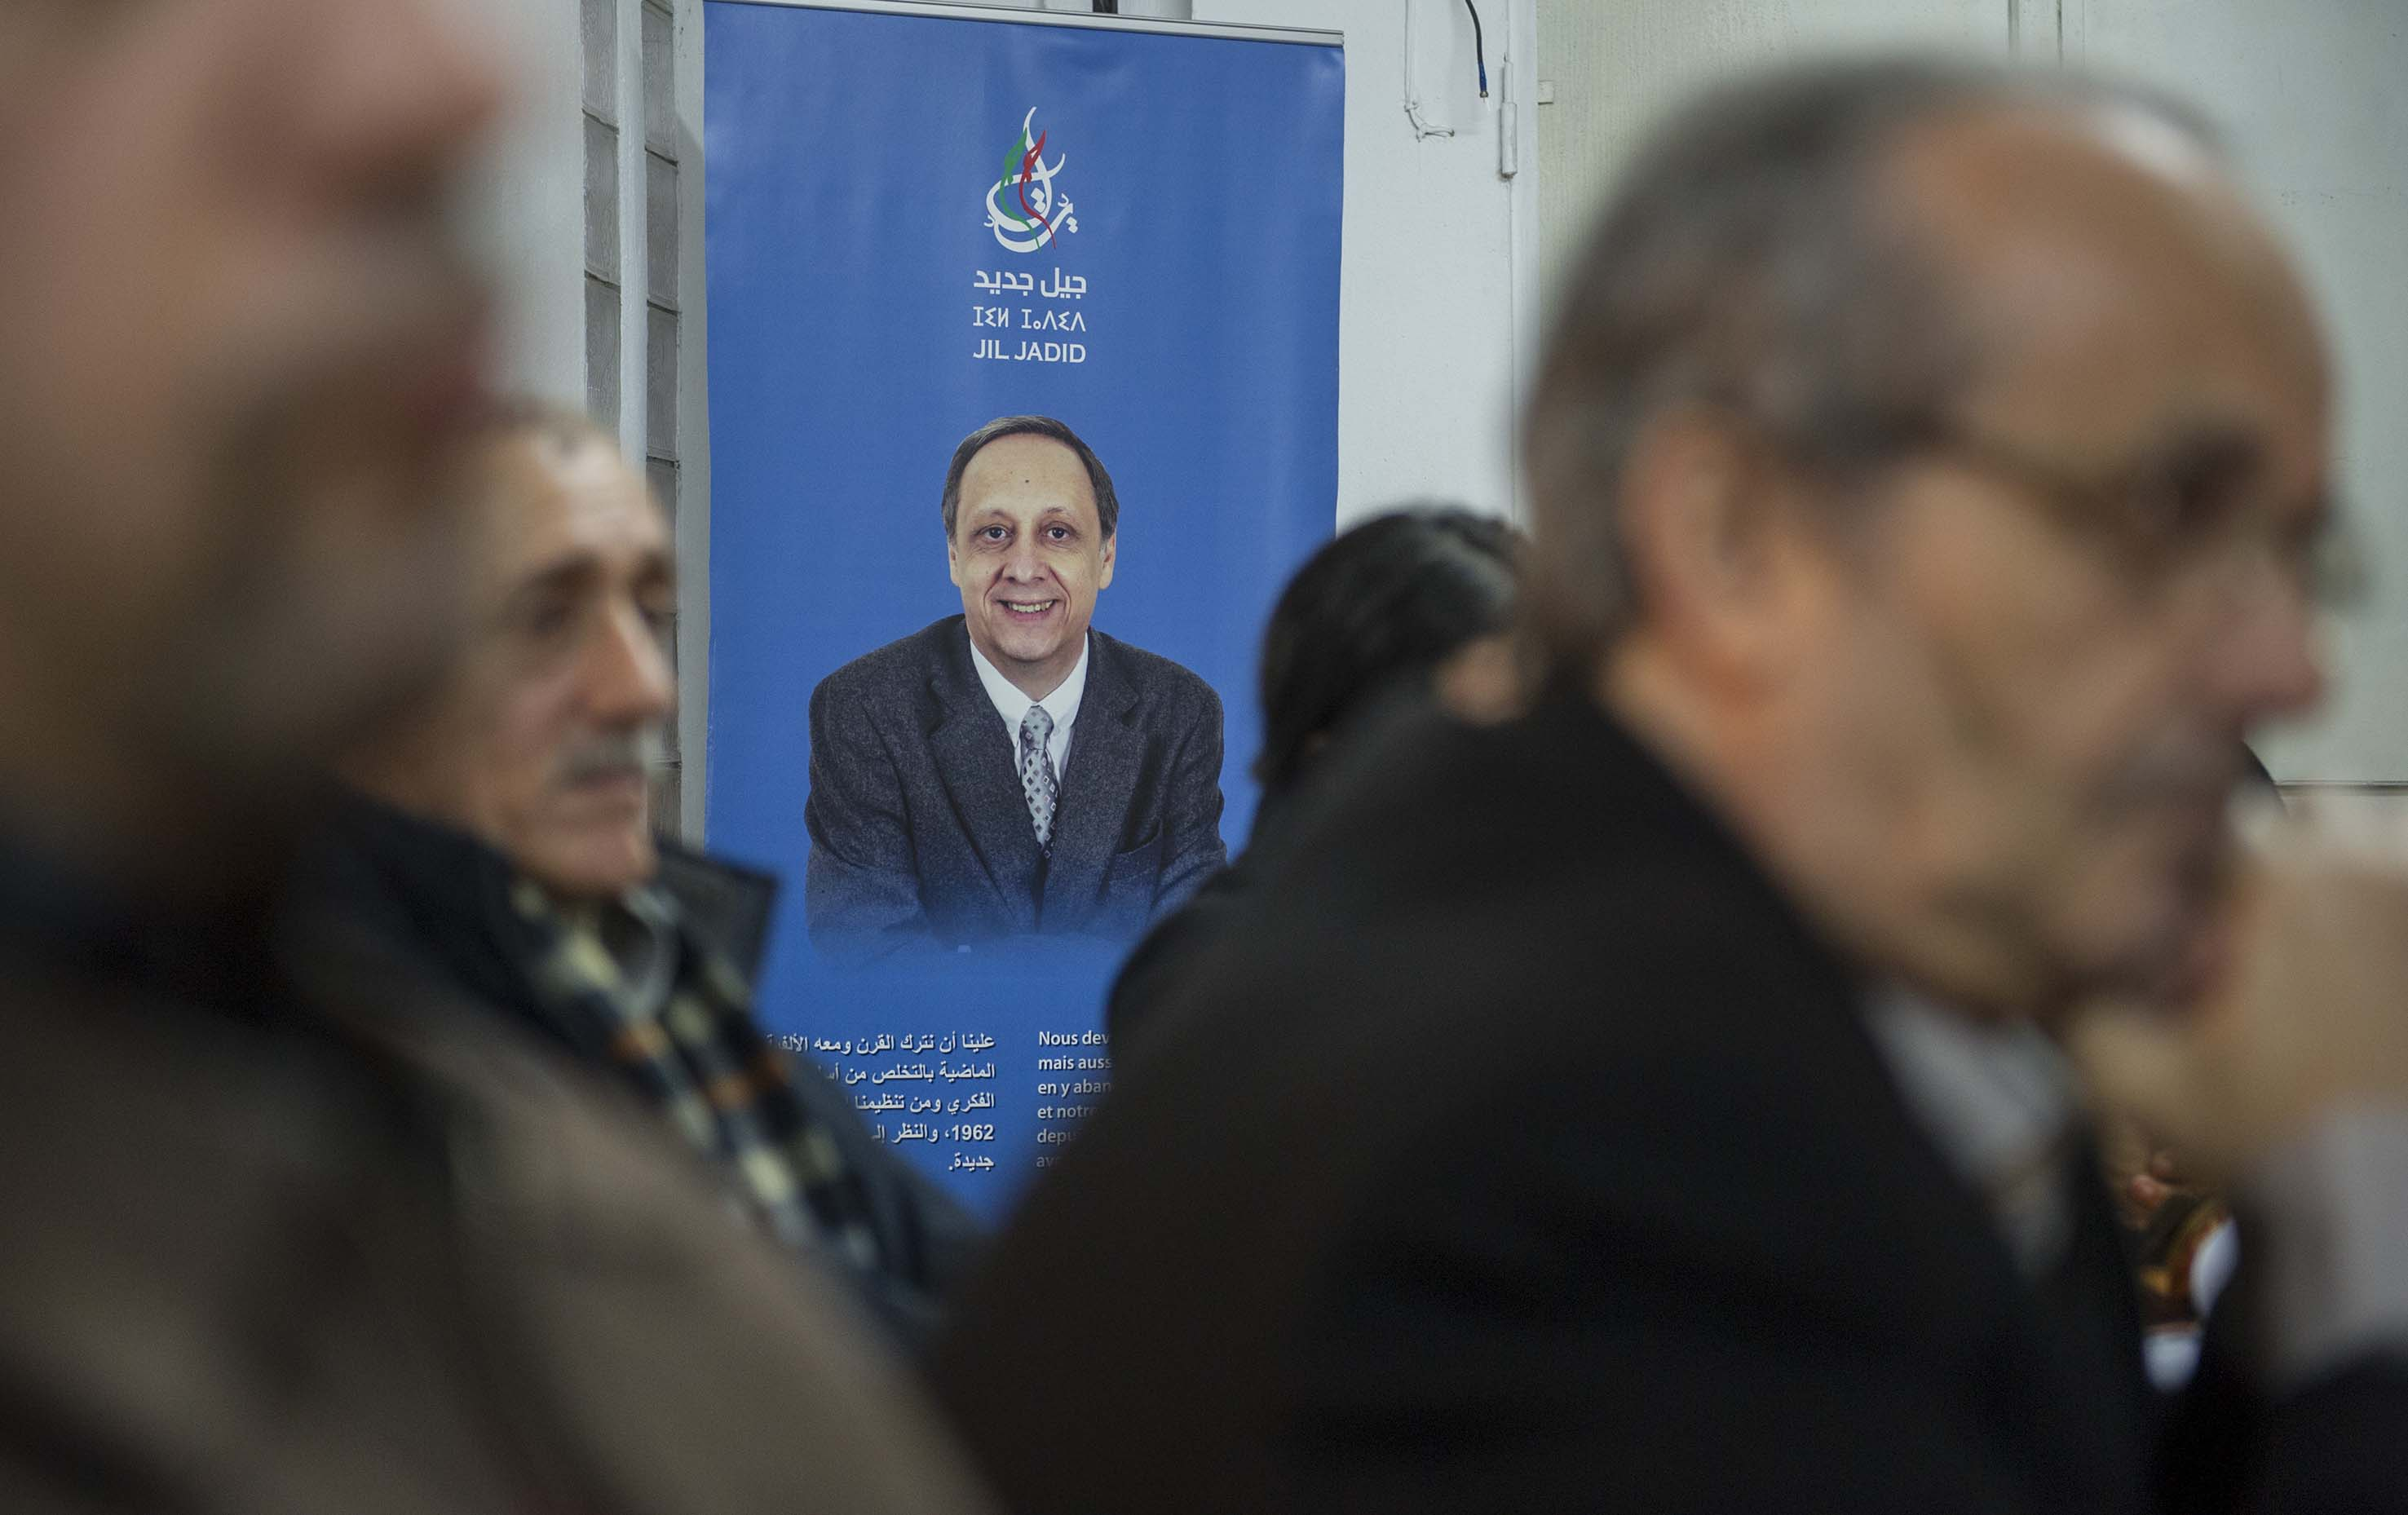 Soufiane Djilali, président de Jil Jadid.